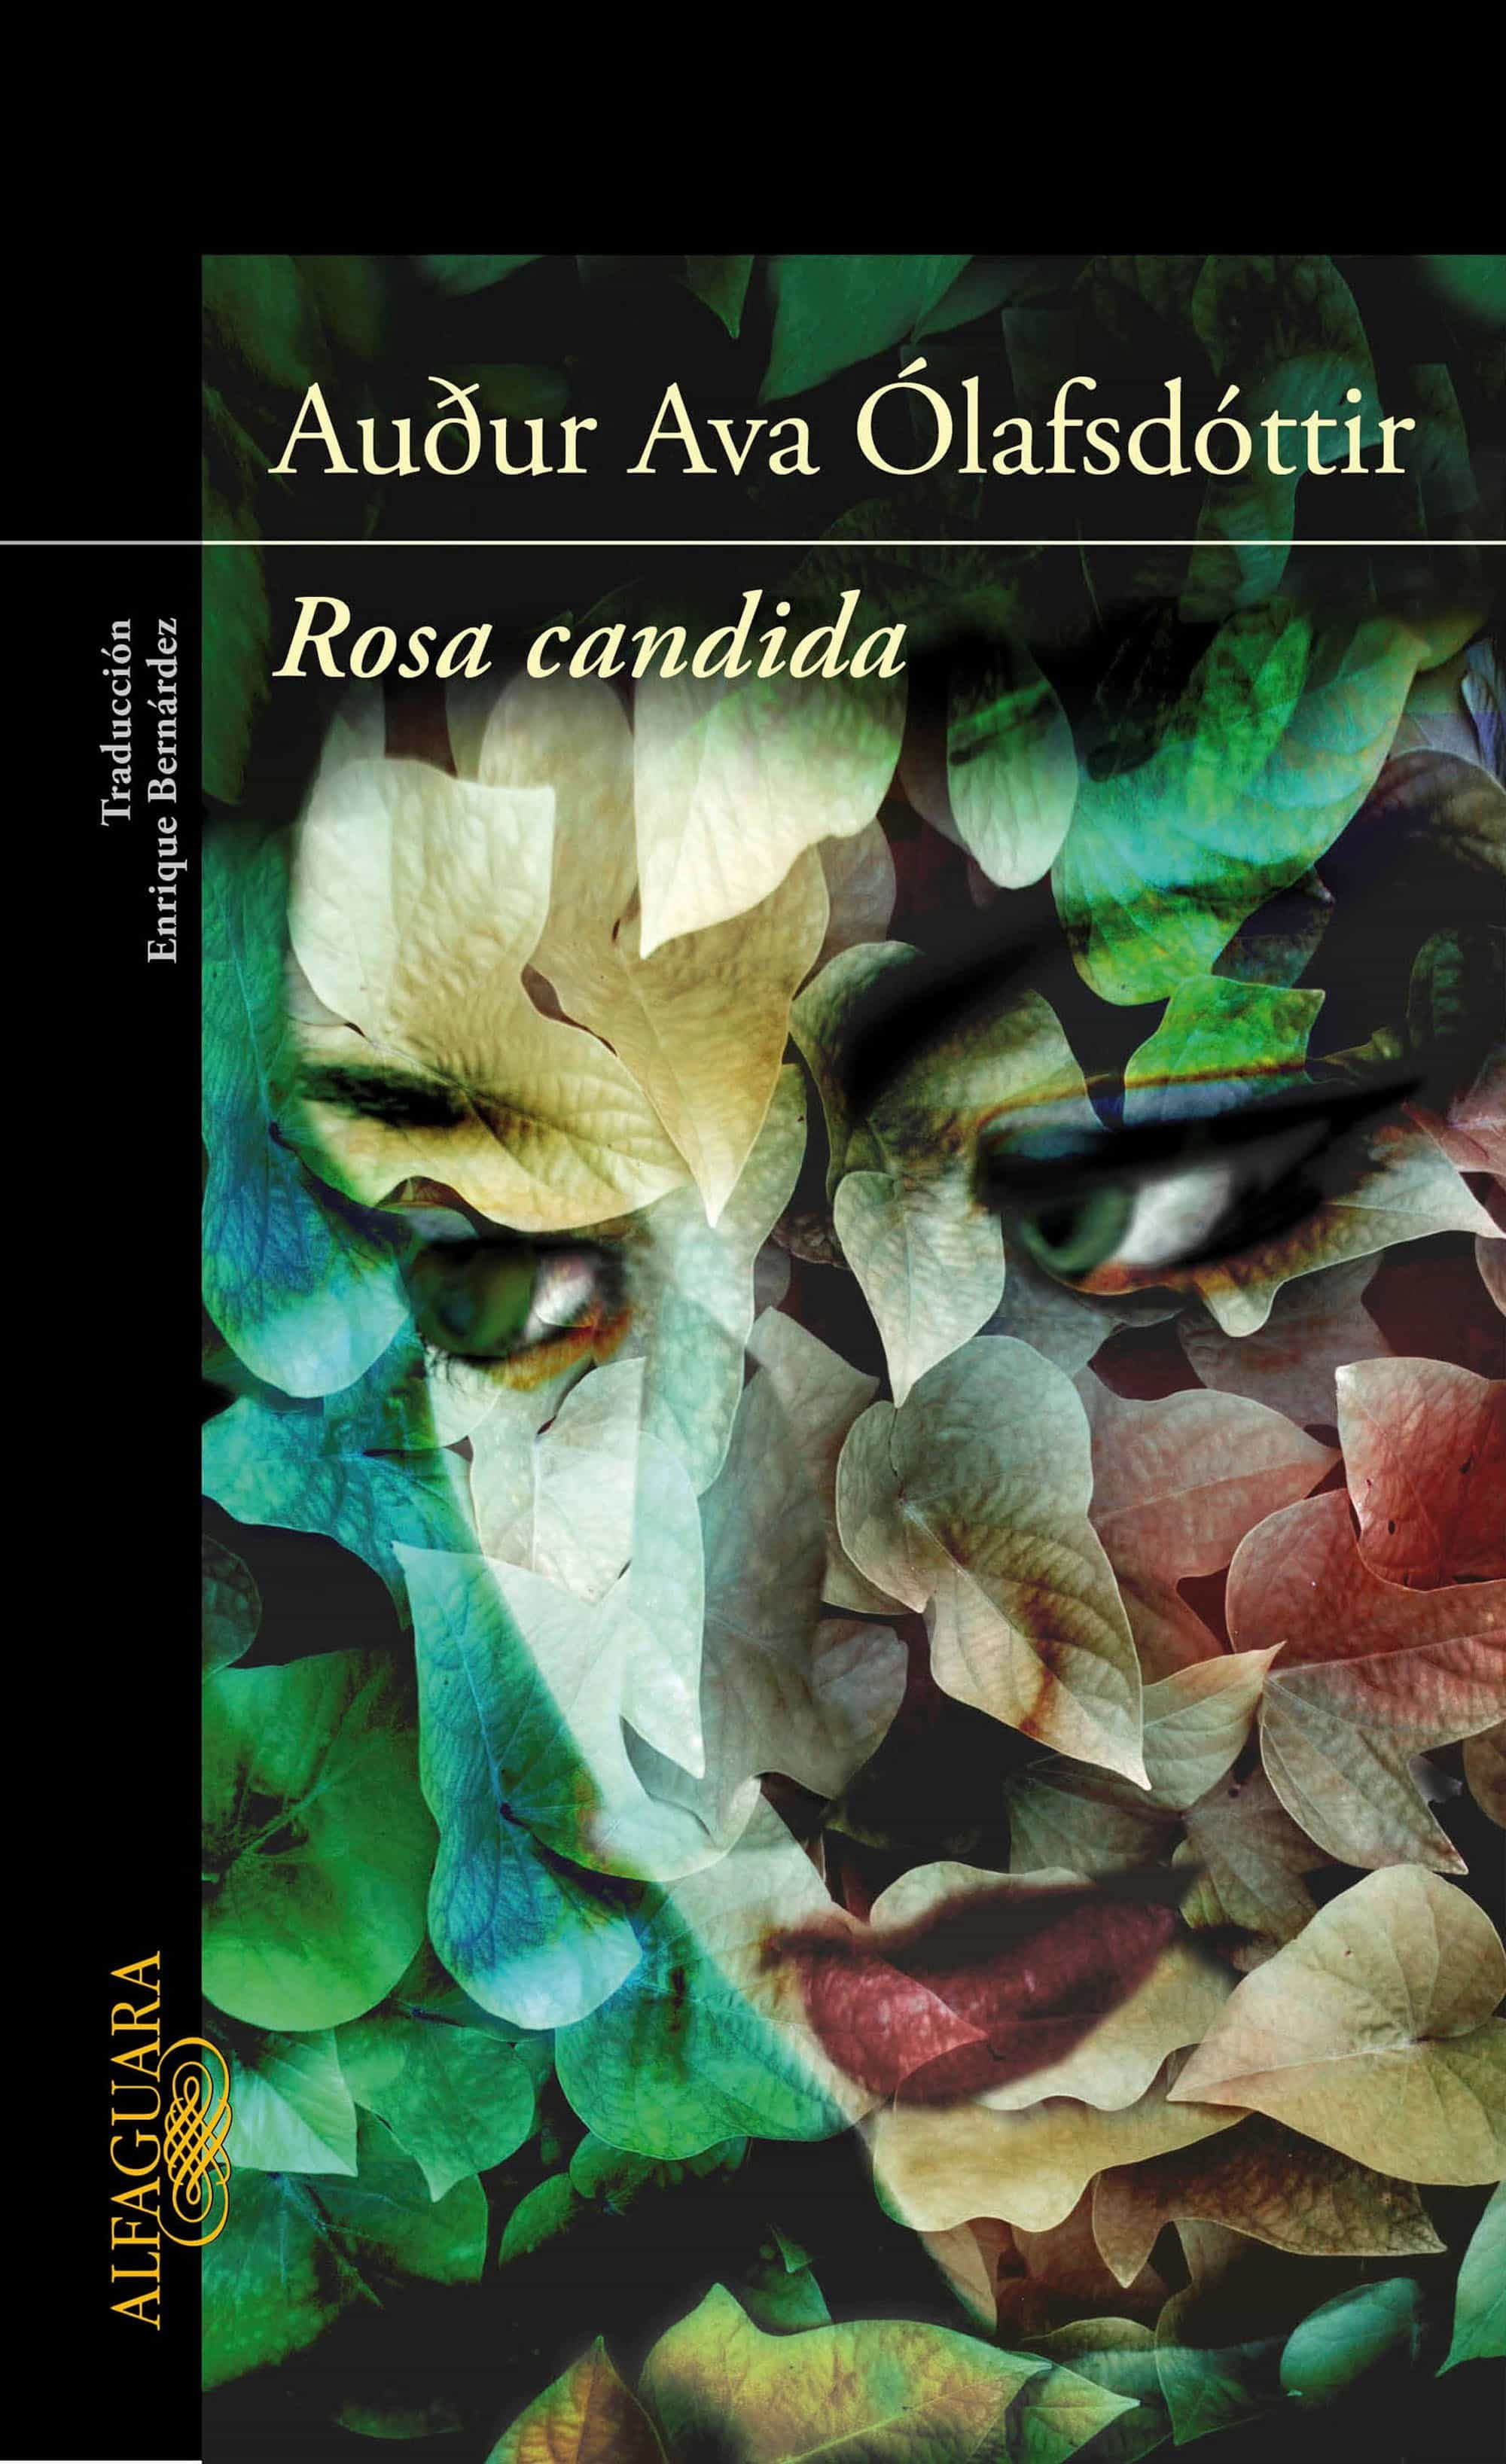 Rosa Candida   por Audur Ava Olafsdottir